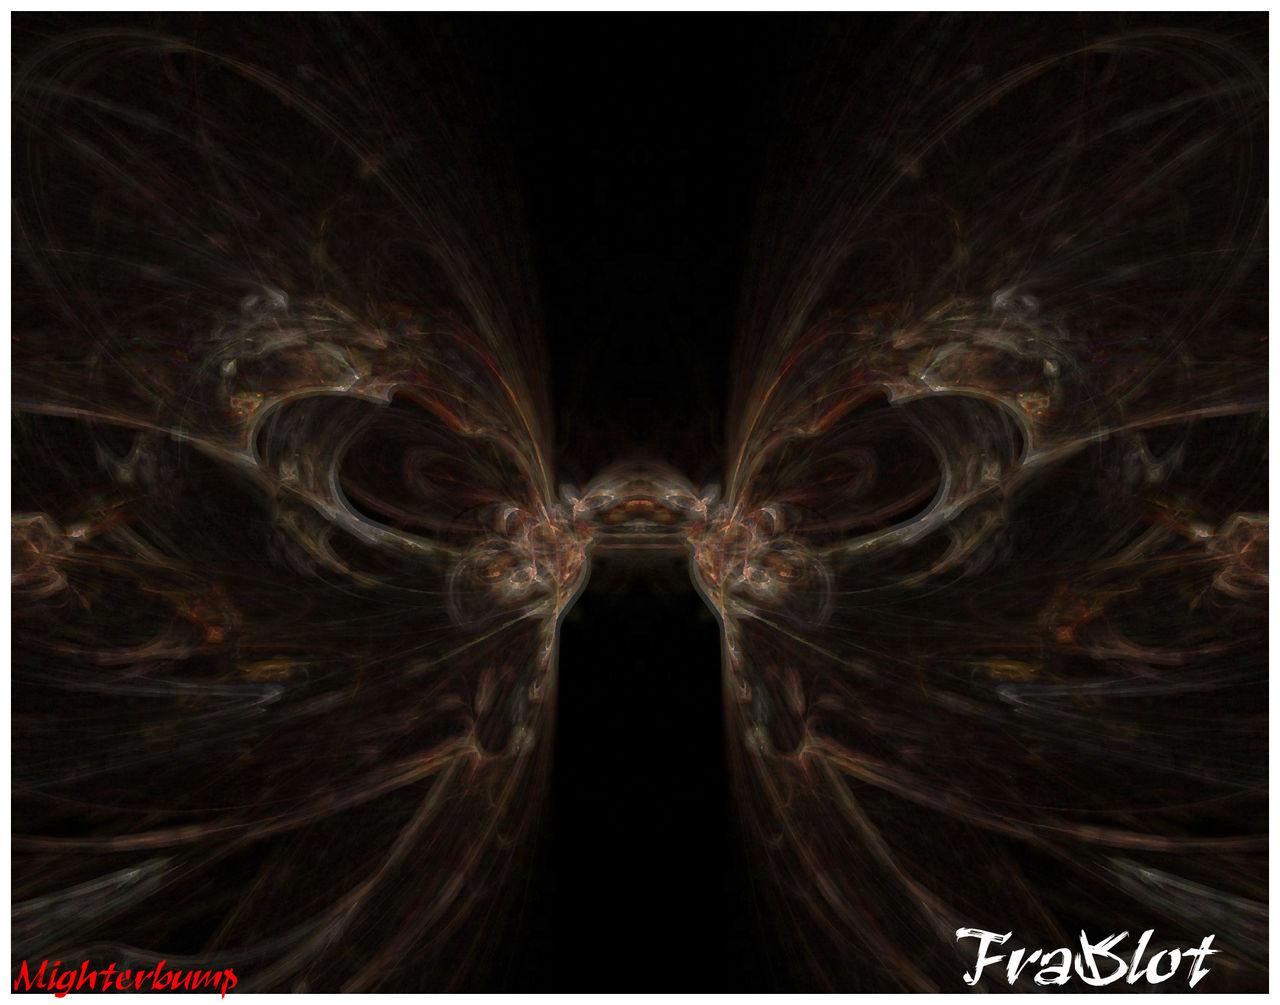 Frakblot-Dragon's Breath